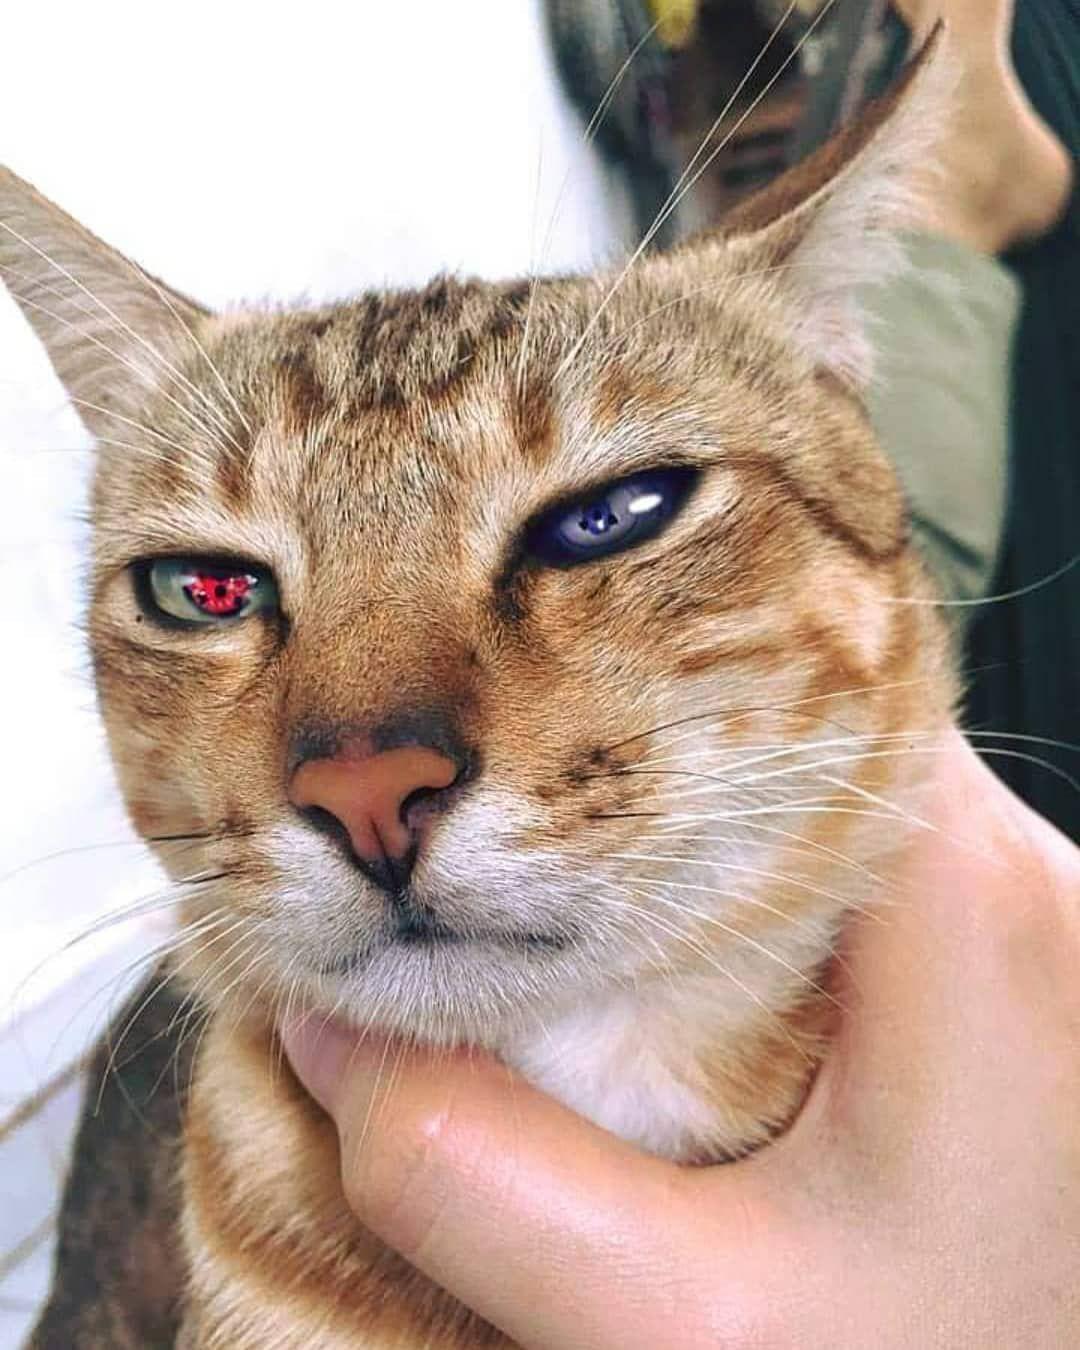 Kucing Kampung Mana Ni Follow Kami Kucing Kampung Mana Ni Follow Kami Malaysiaigers Haiwanku Lawak Cats Cats And Kittens Kami